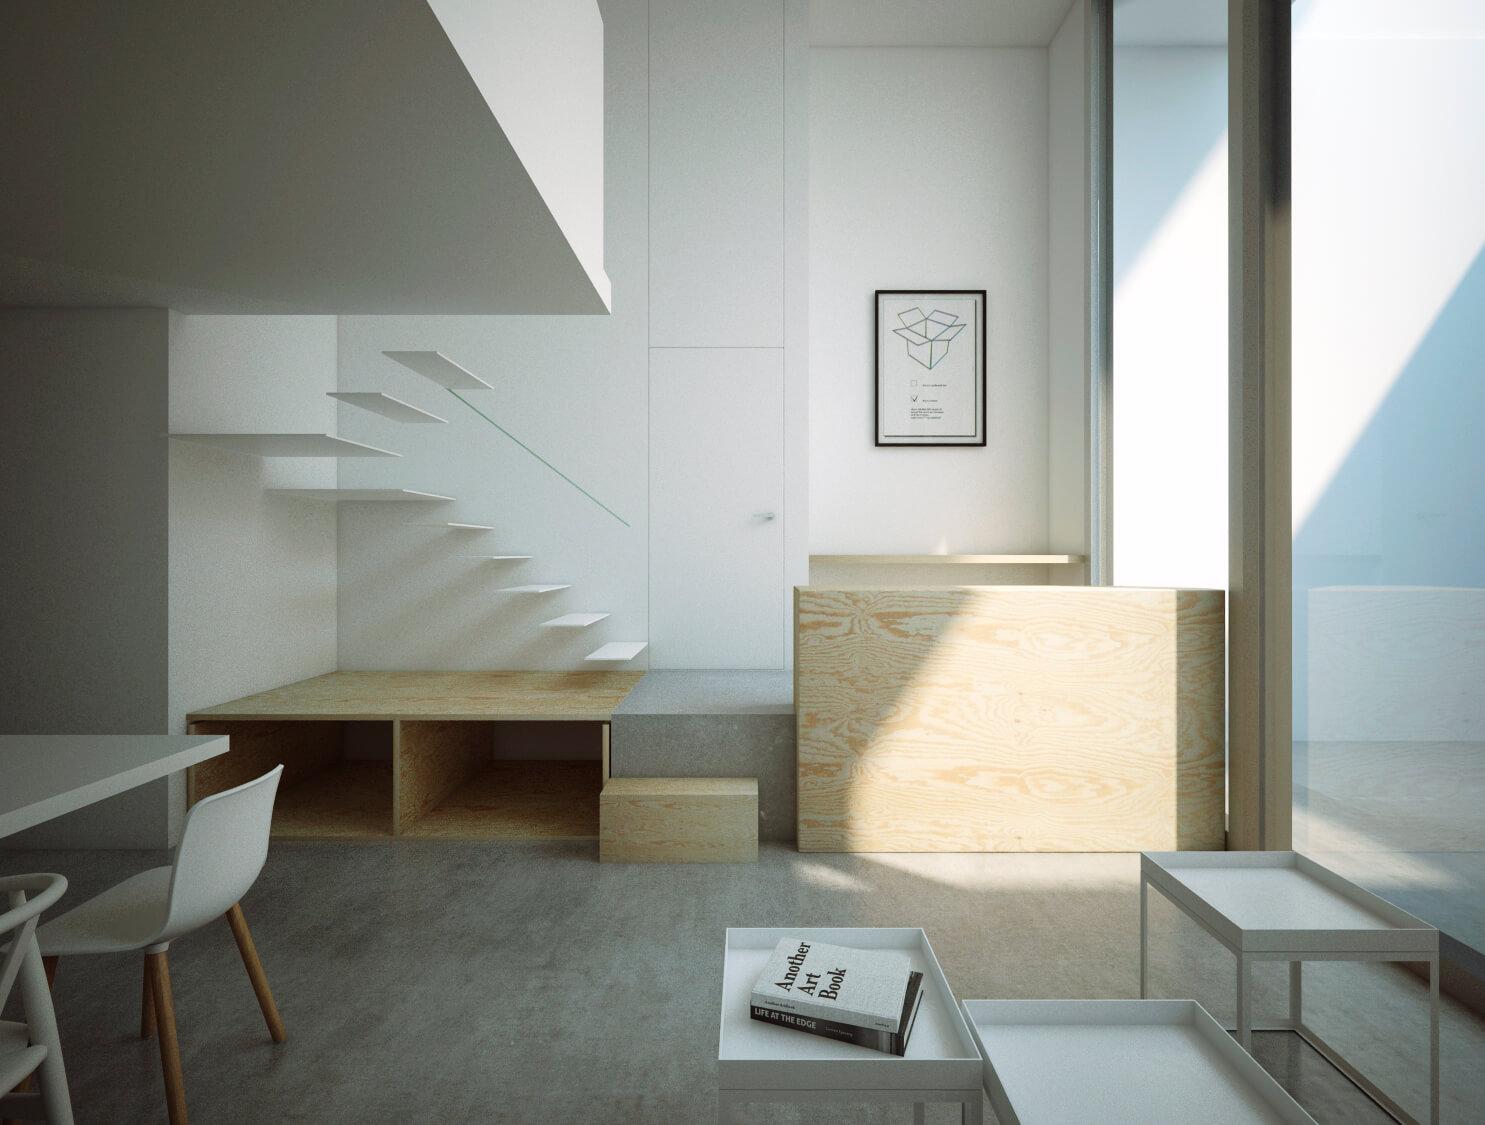 planell-hirsch_arquitectura_interiorismo_rehabilitacion_barcelonac14 p contrast